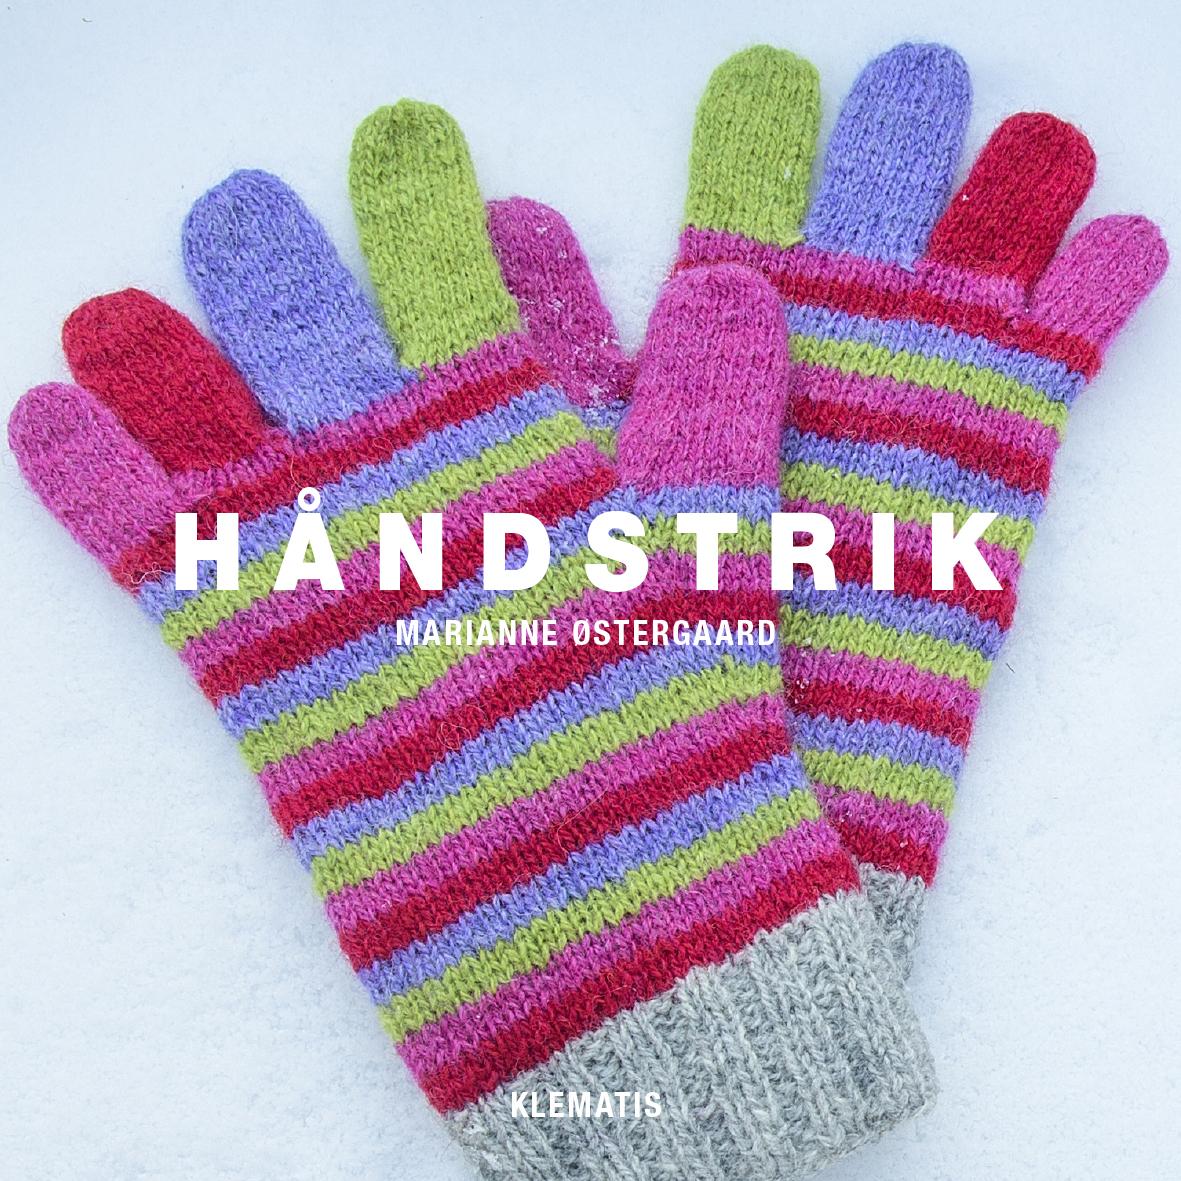 Håndstrik